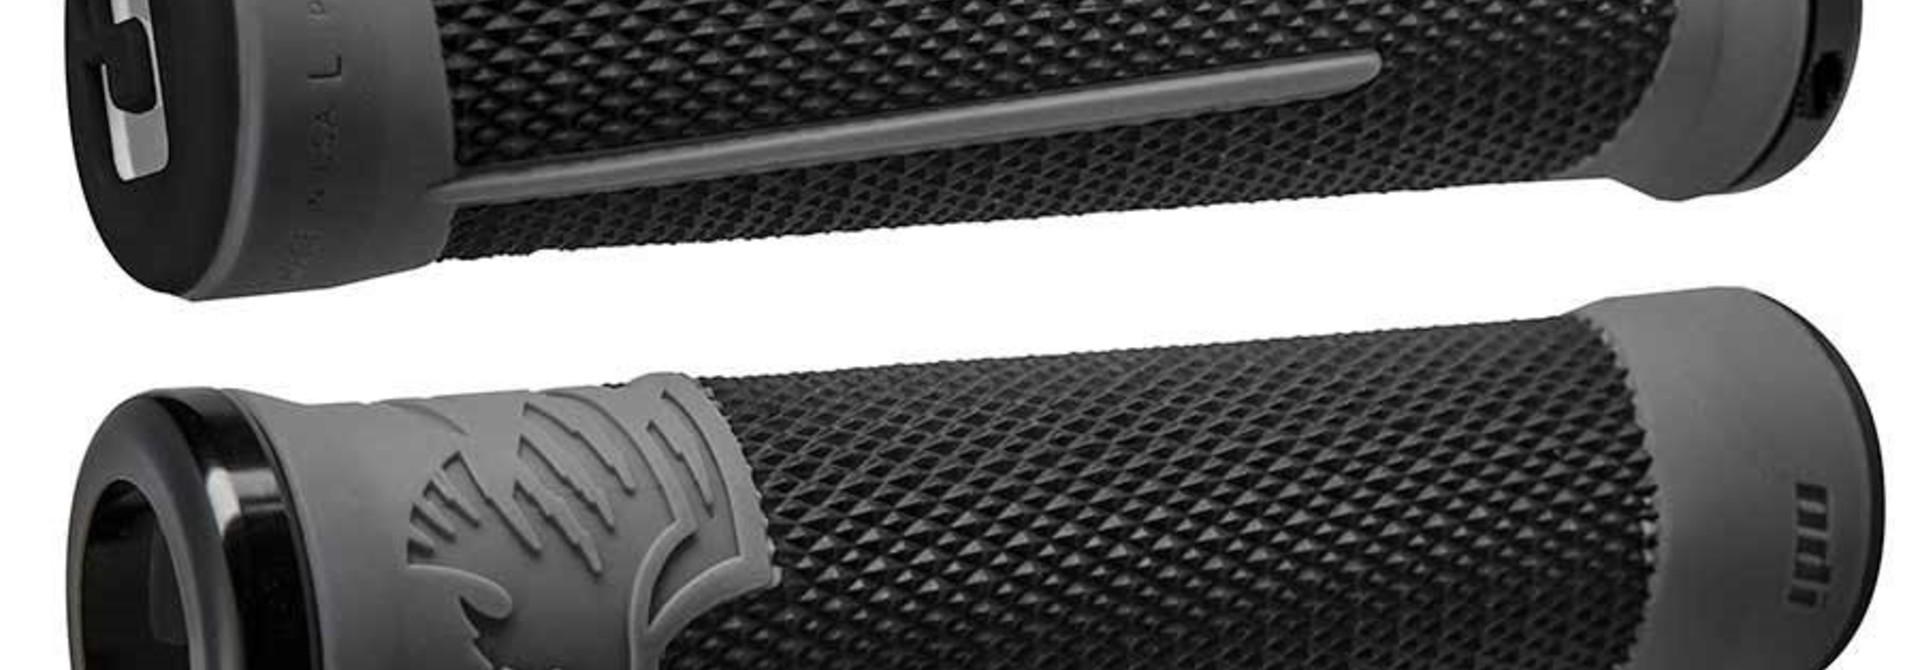 ODI, AG-2 Signature, Grips, 135mm, Black/Graphite/Black, Pair